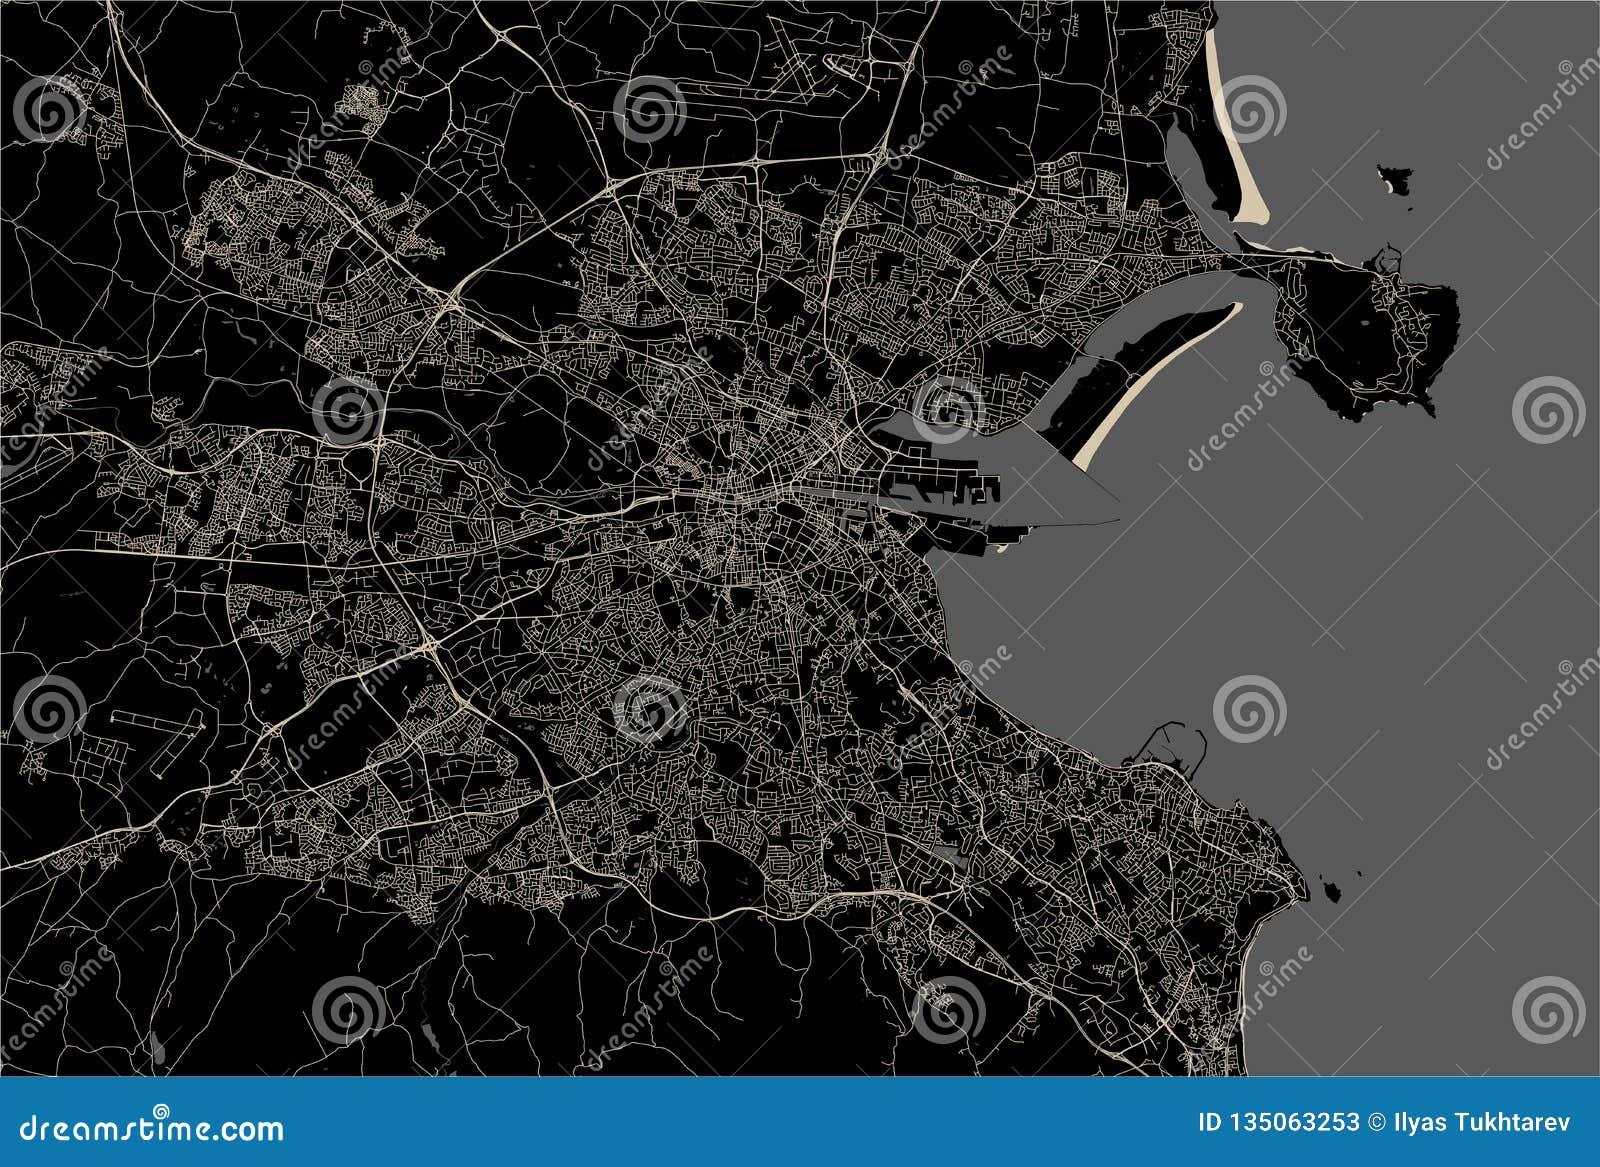 Map Of The City Of Dublin, Ireland Stock Vector ...